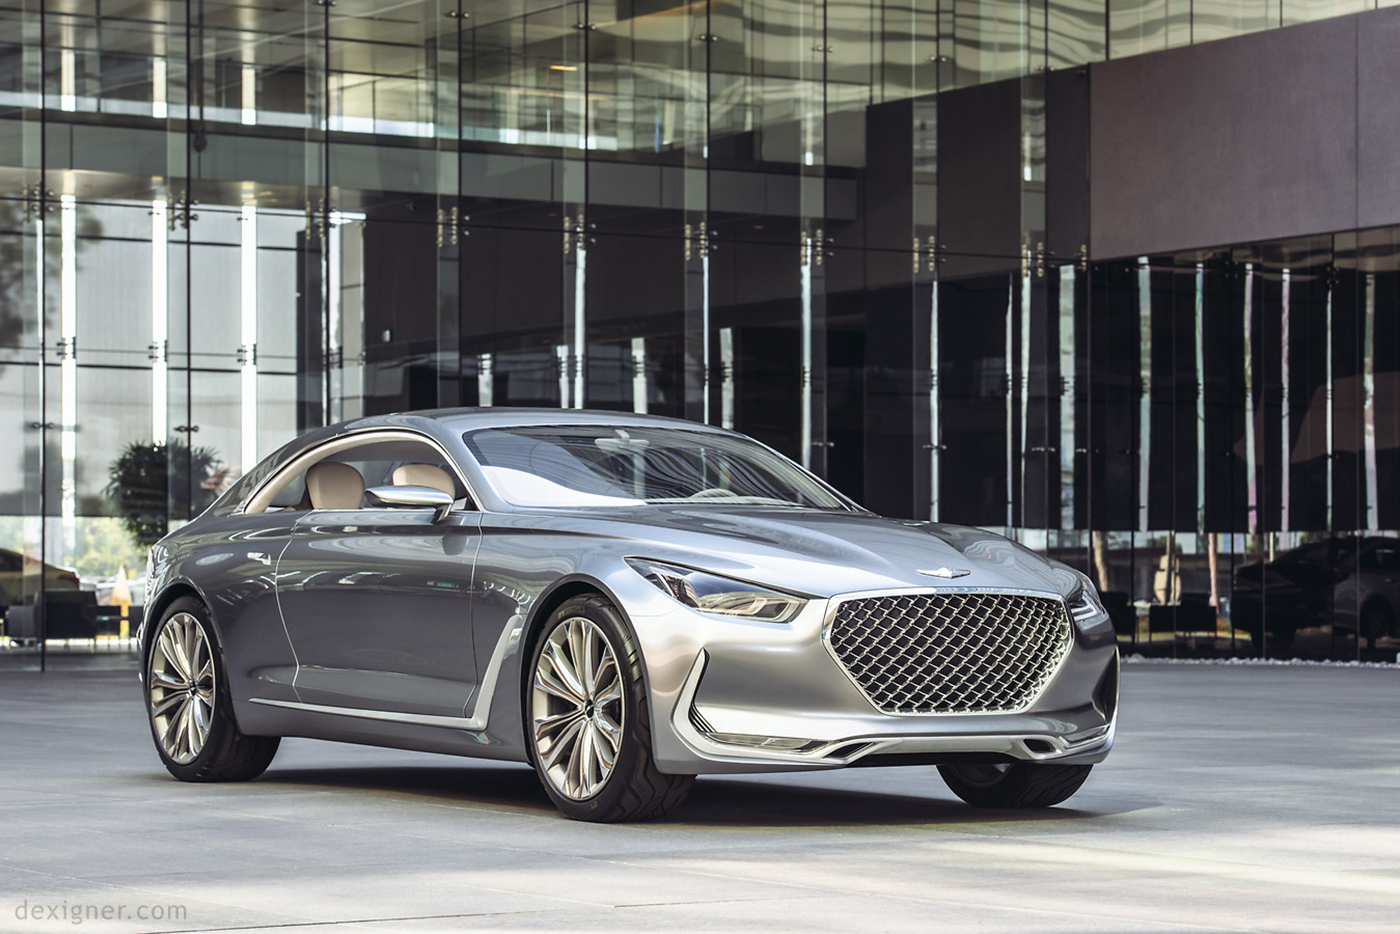 hyundai-vision-g-coupe-concept-2.jpg